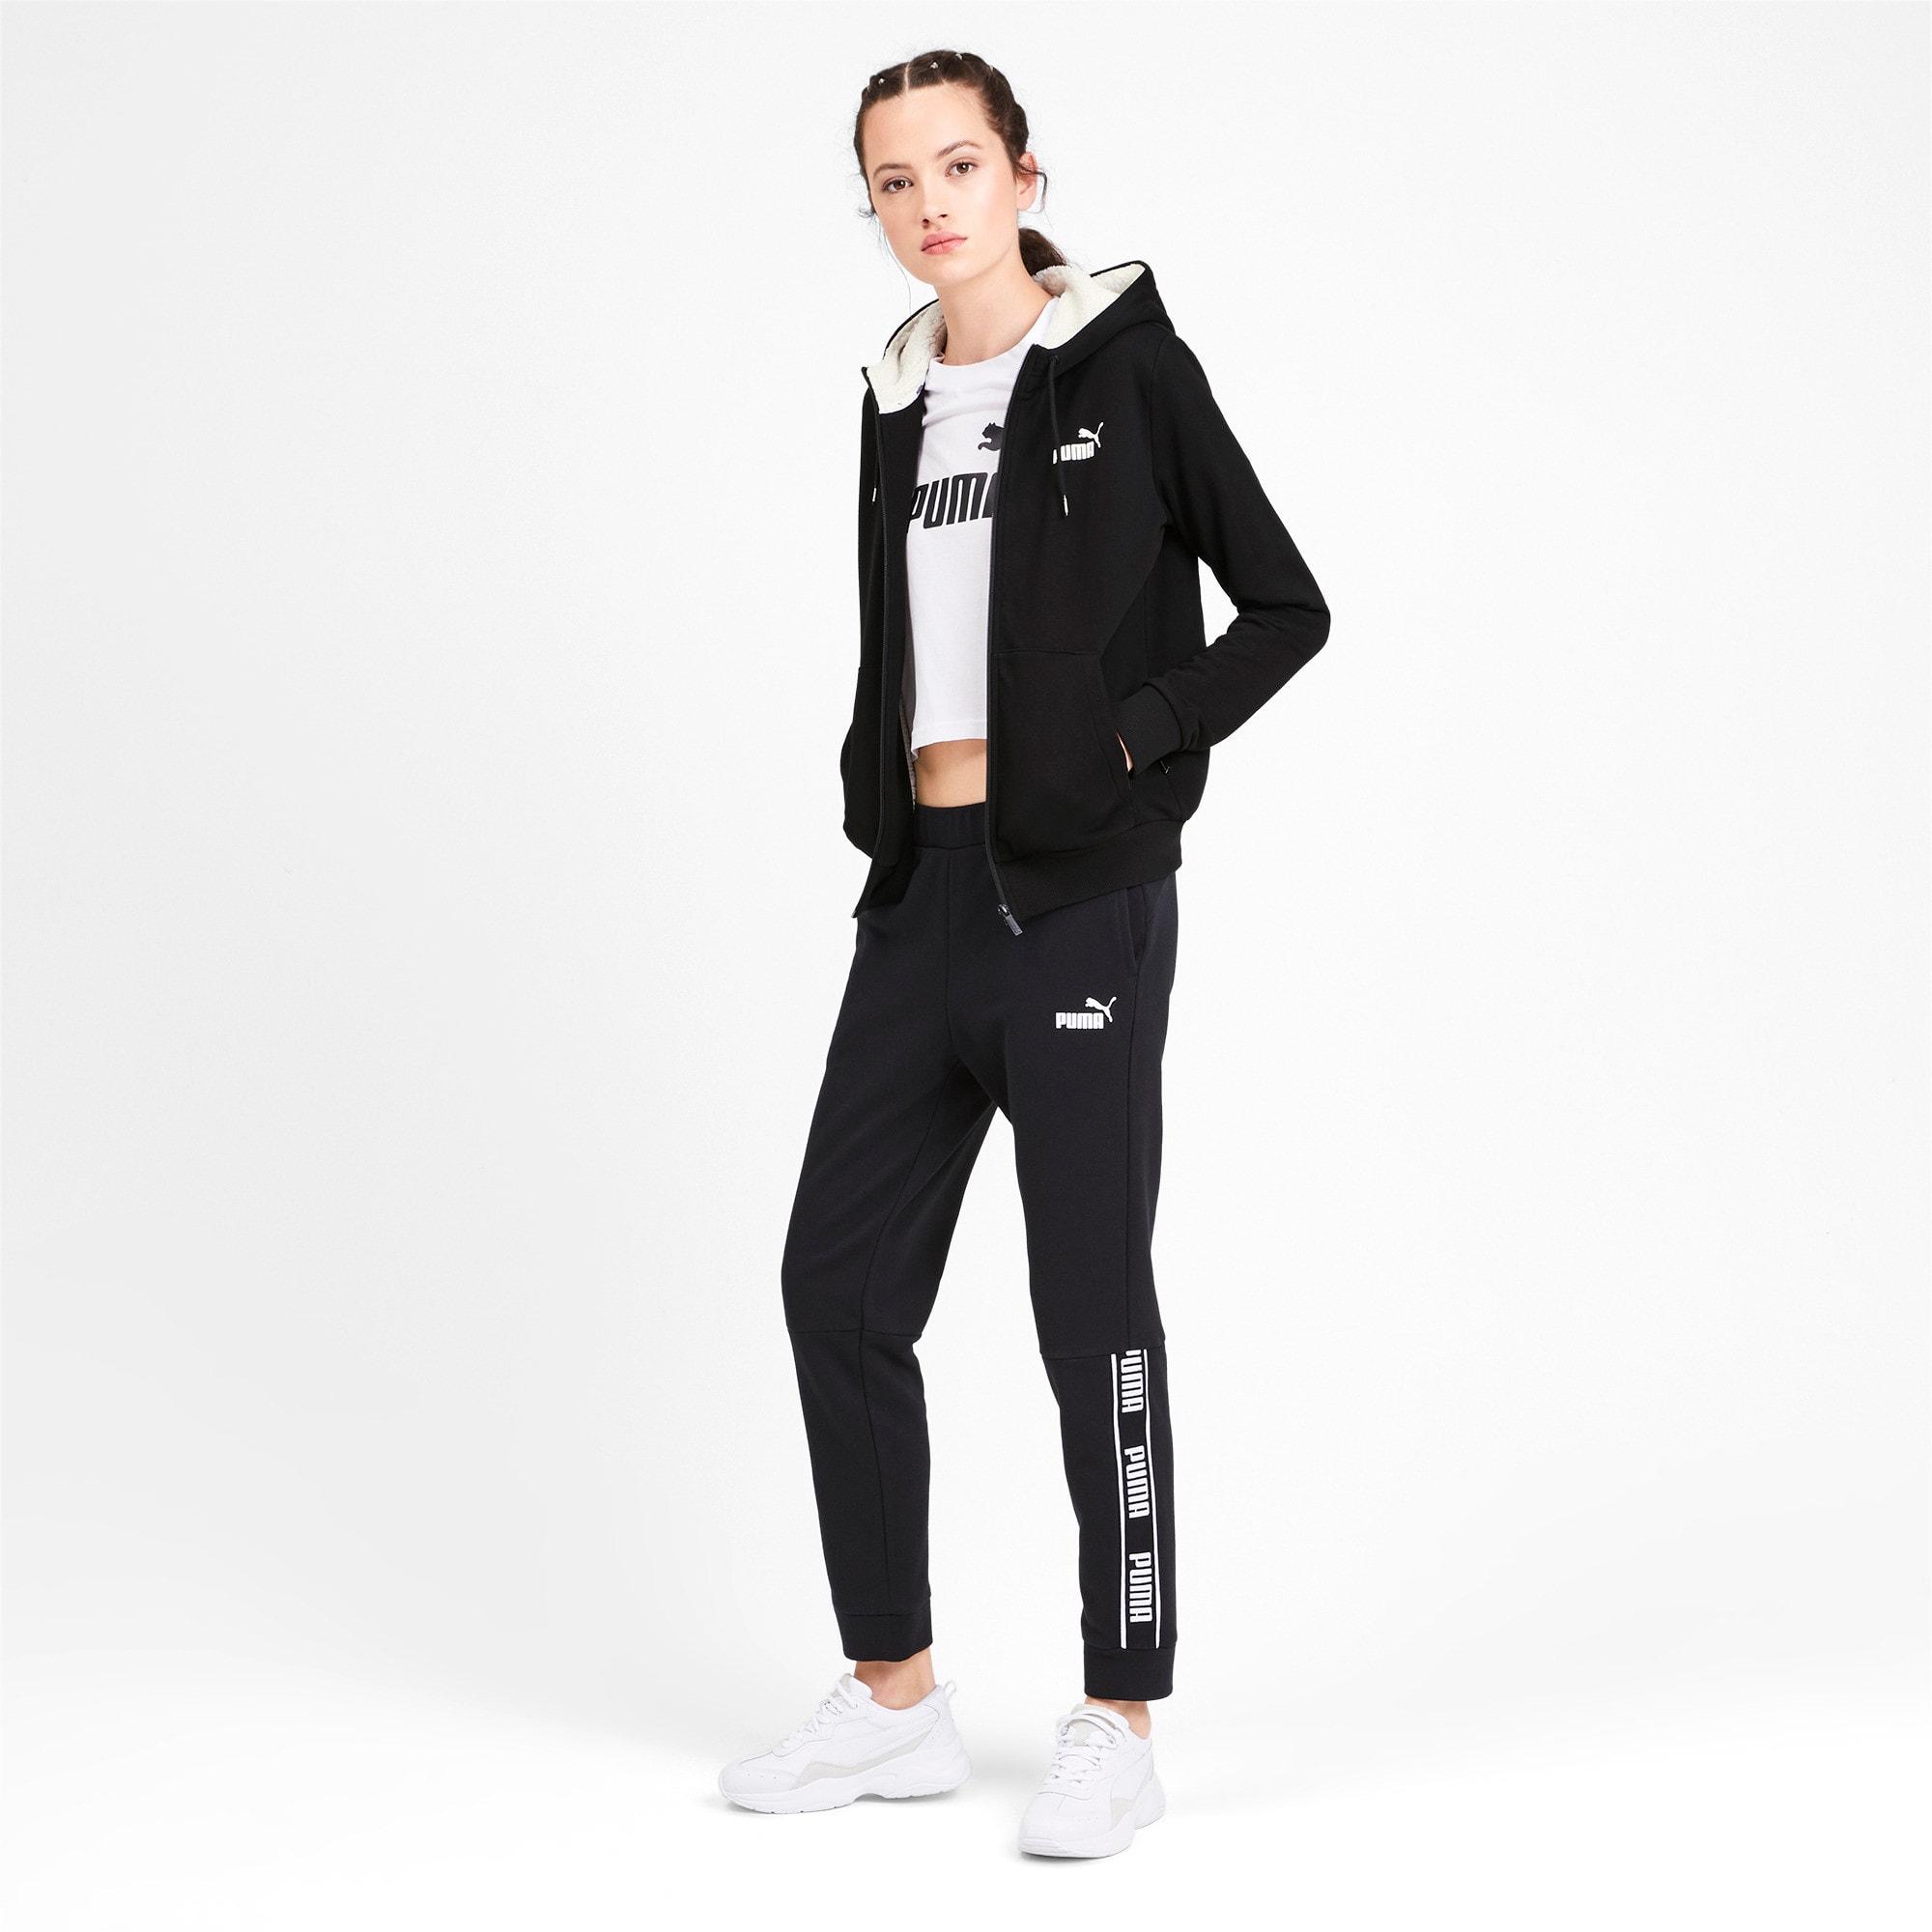 Miniatura 3 de Chaqueta con capucha Essentials + Sherpa para mujer, Cotton Black, mediano